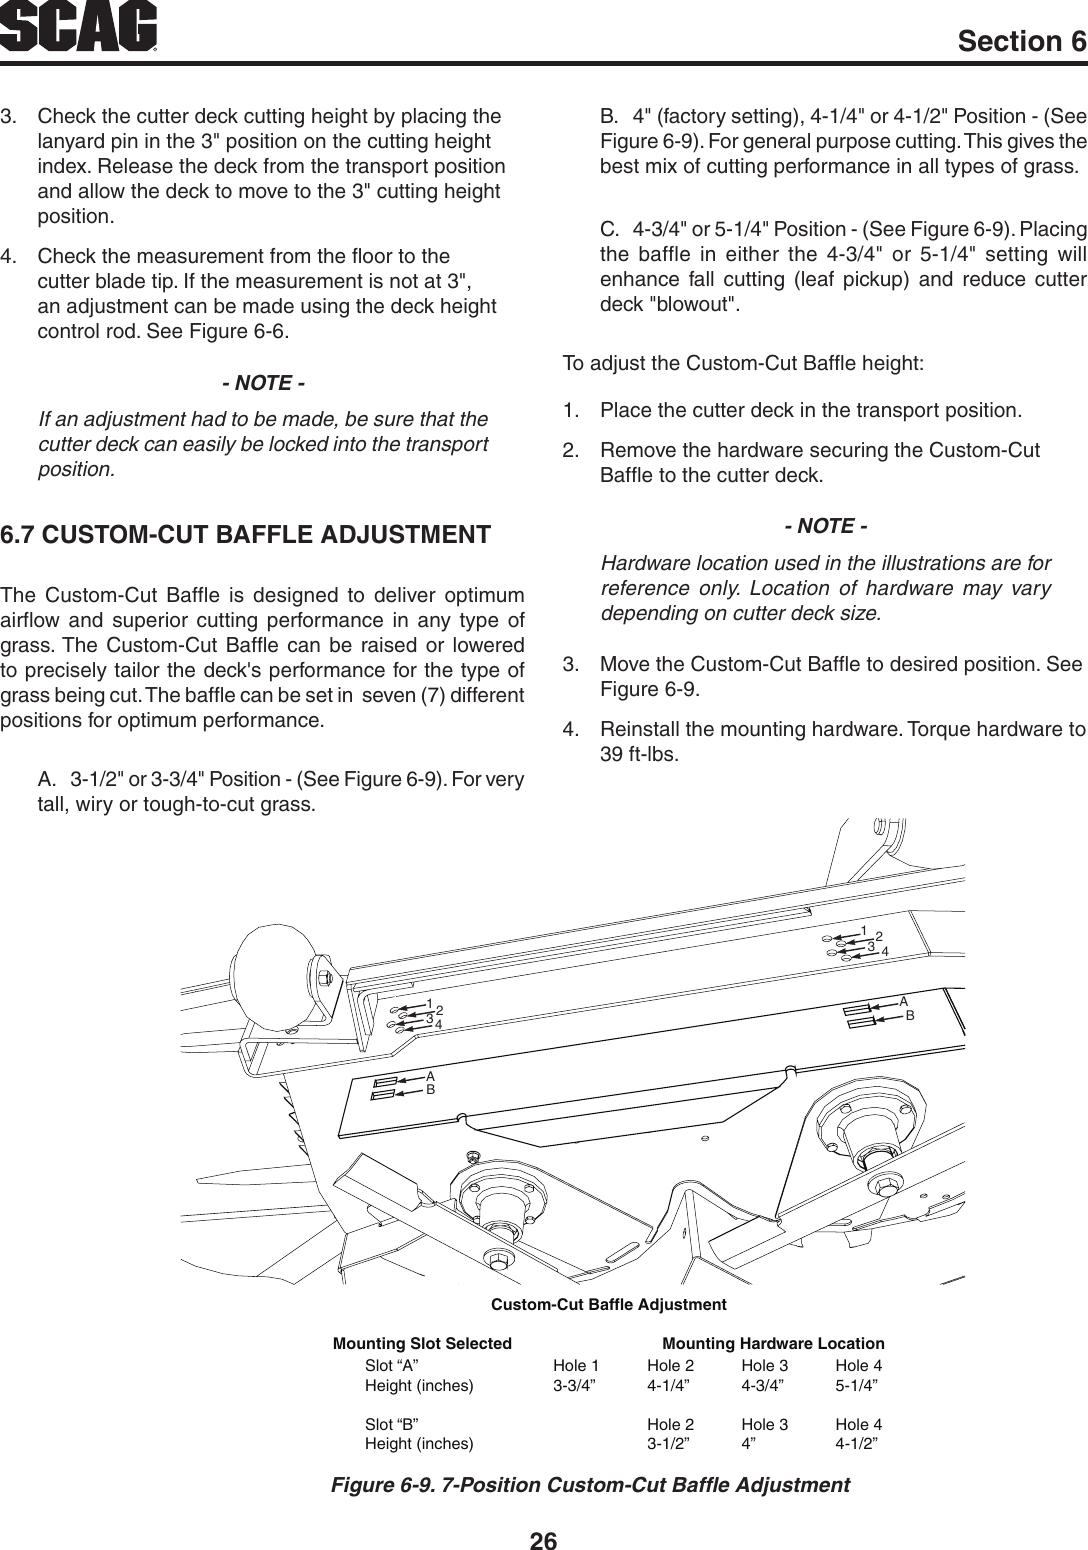 Scag Power Equipment Tiger Cat Stc48V 22Fs Users Manual STC